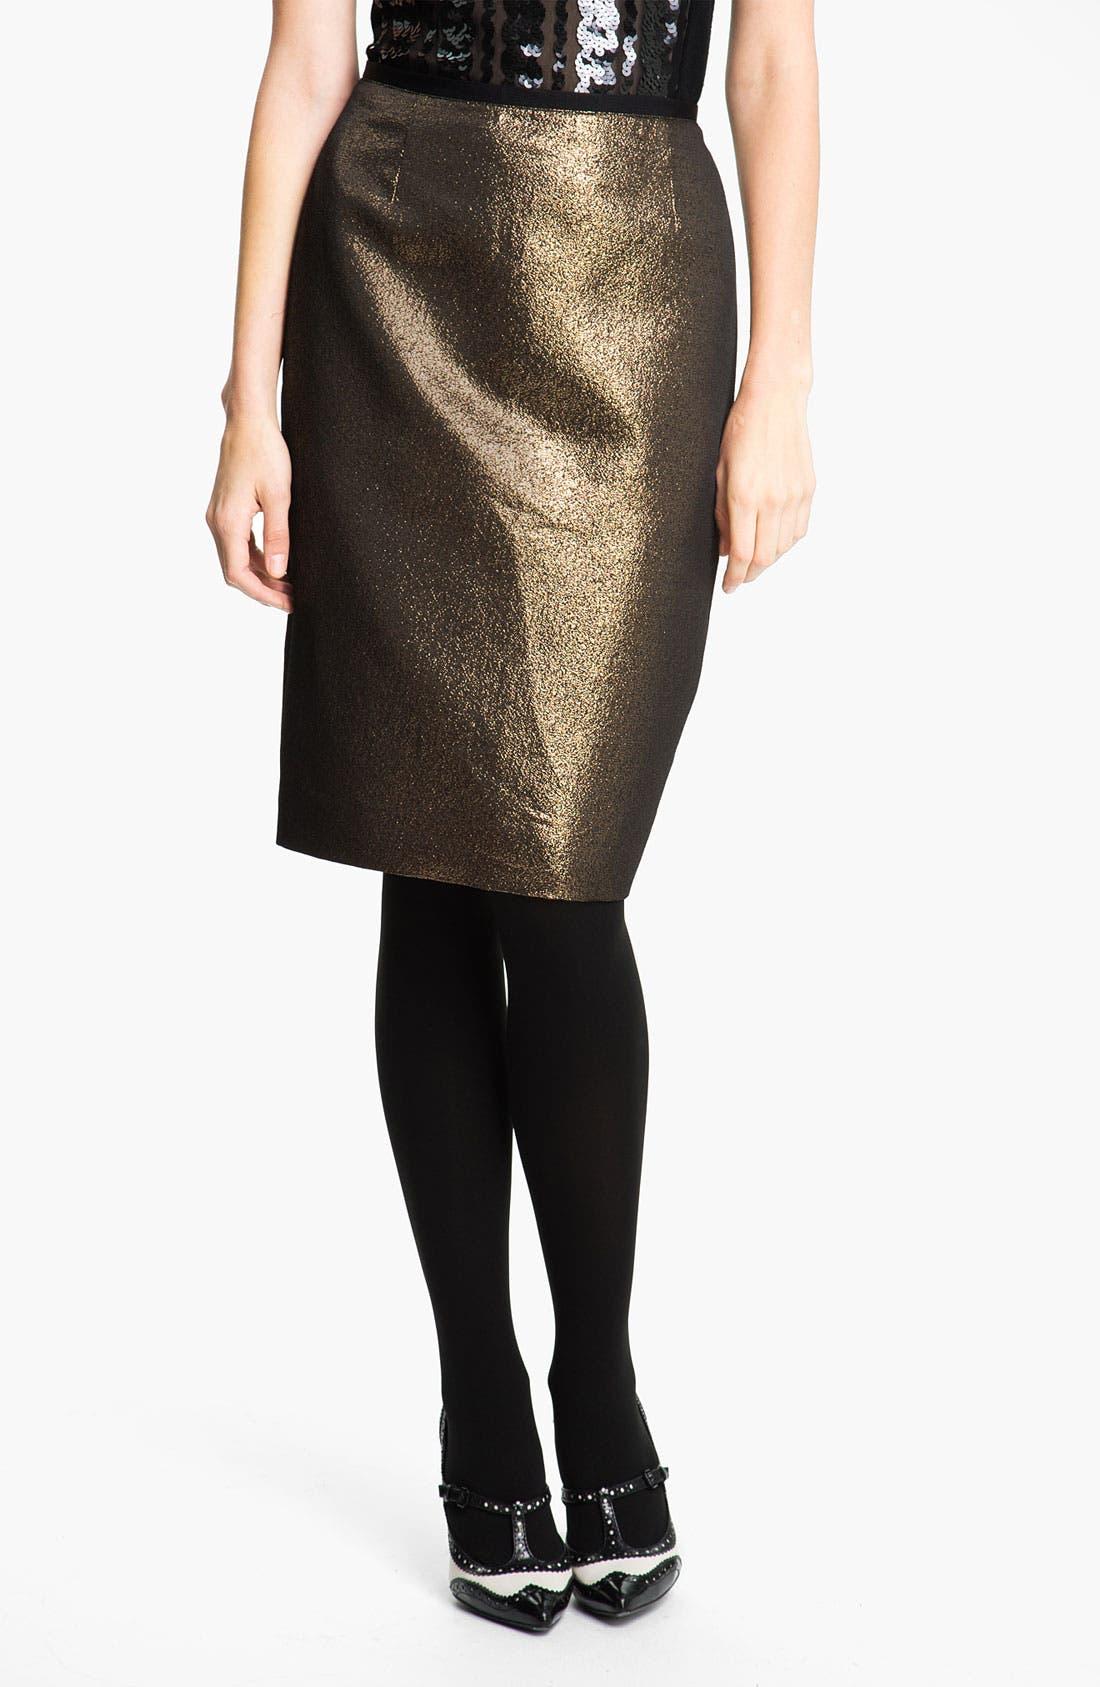 Alternate Image 1 Selected - Tory Burch 'Brandy' Skirt